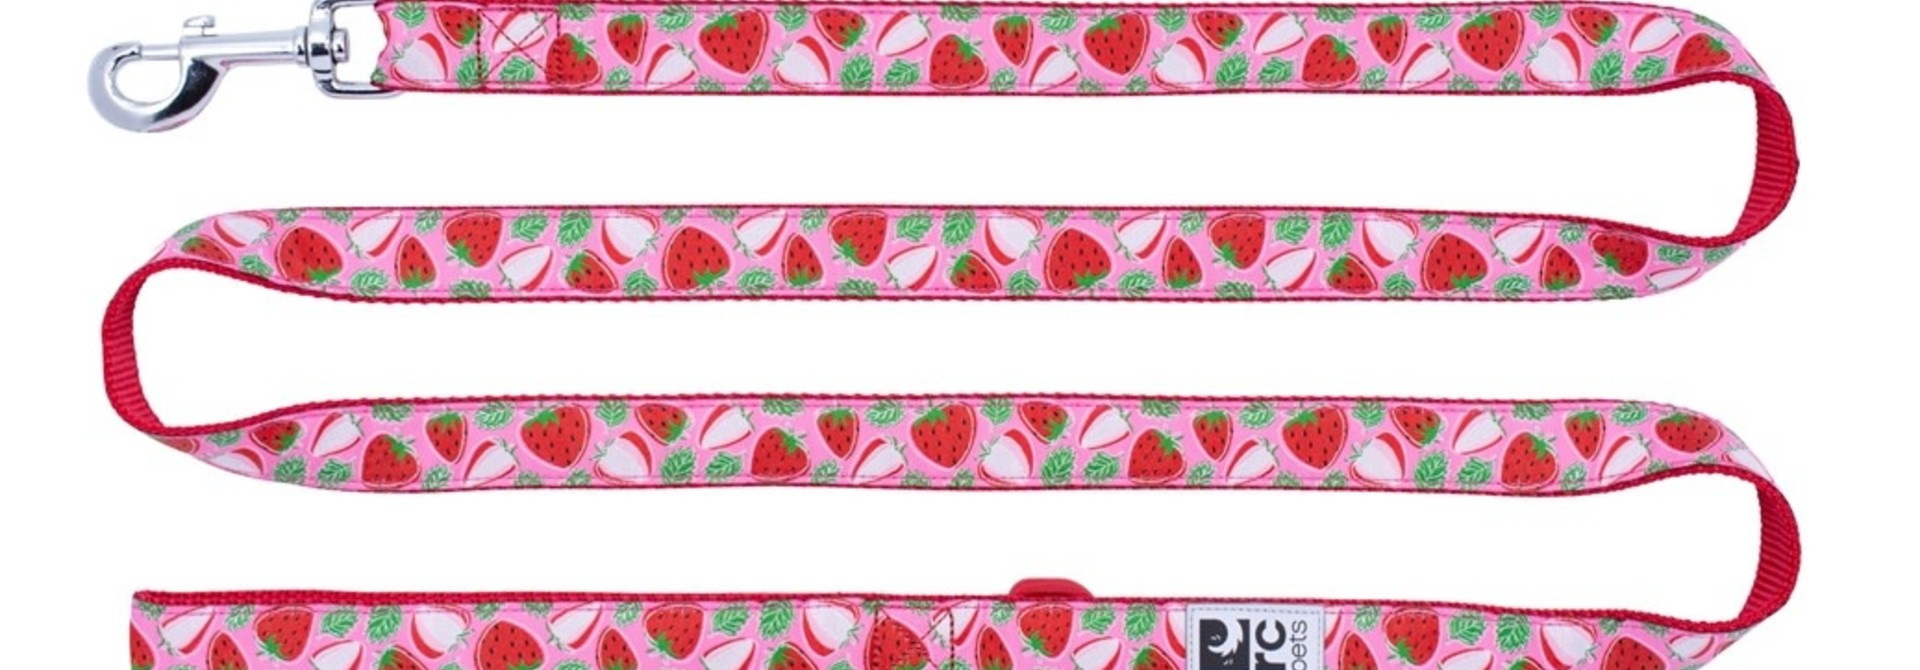 Leash 1x6 Strawberries